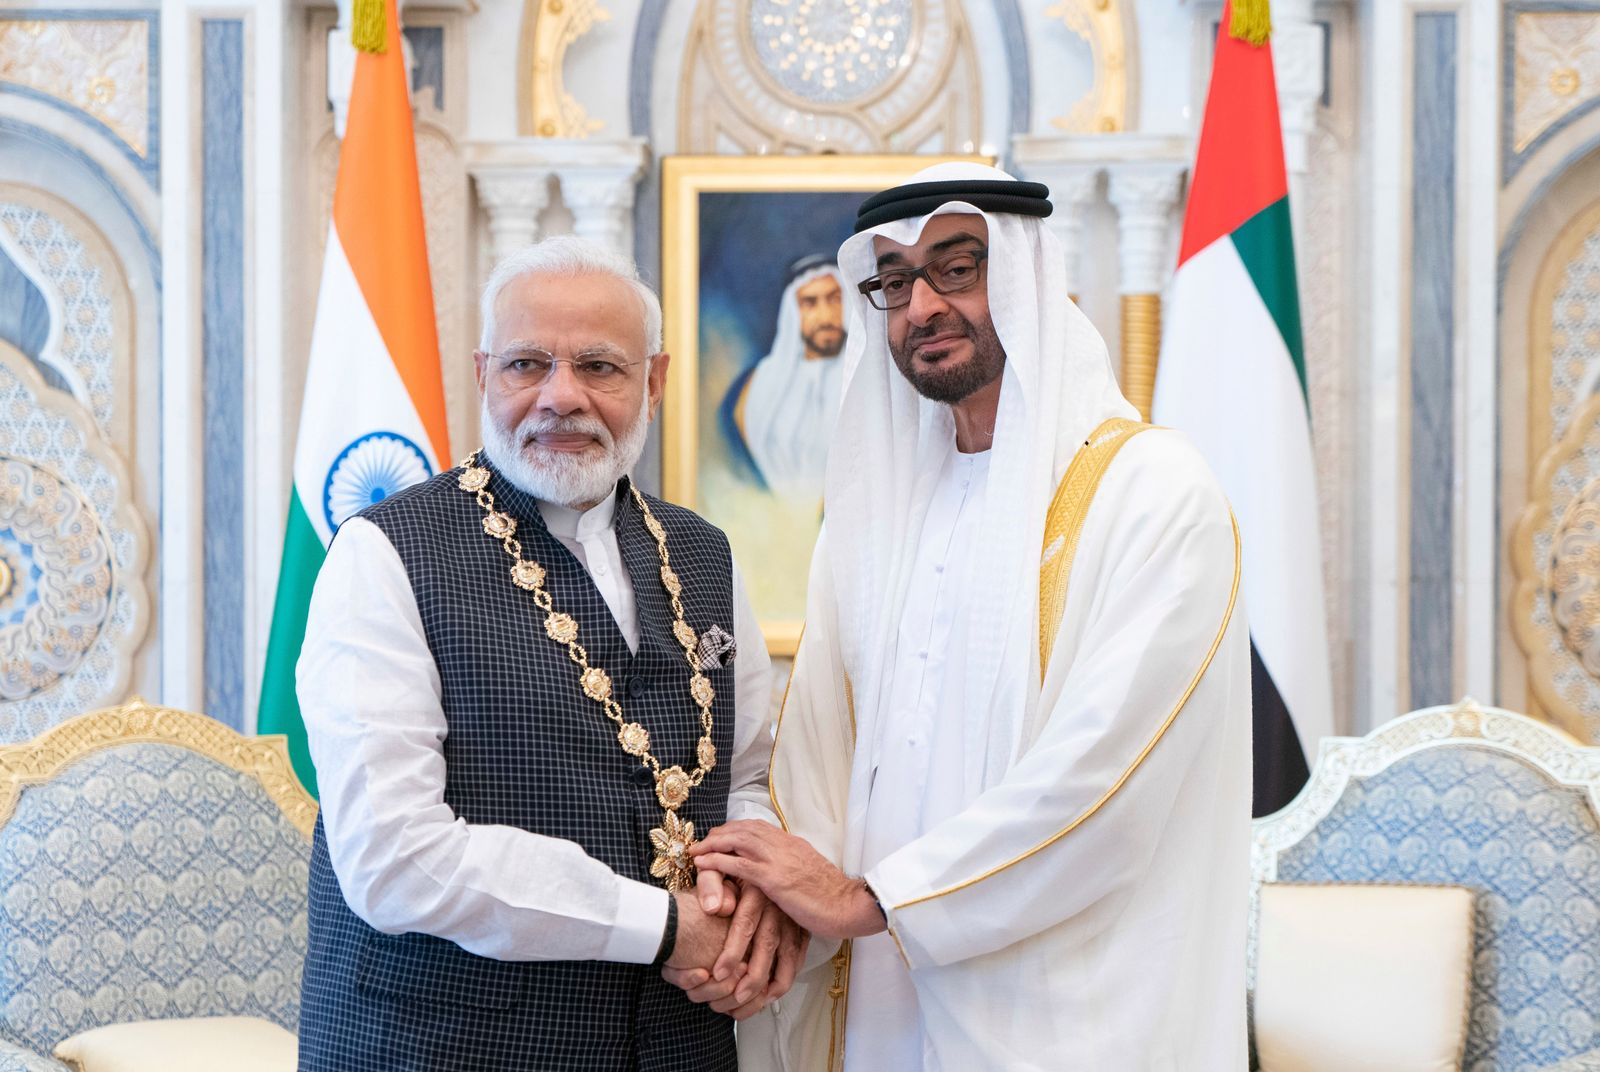 Nrendra Modi/Mohamed bin Zayed Al Nahyan